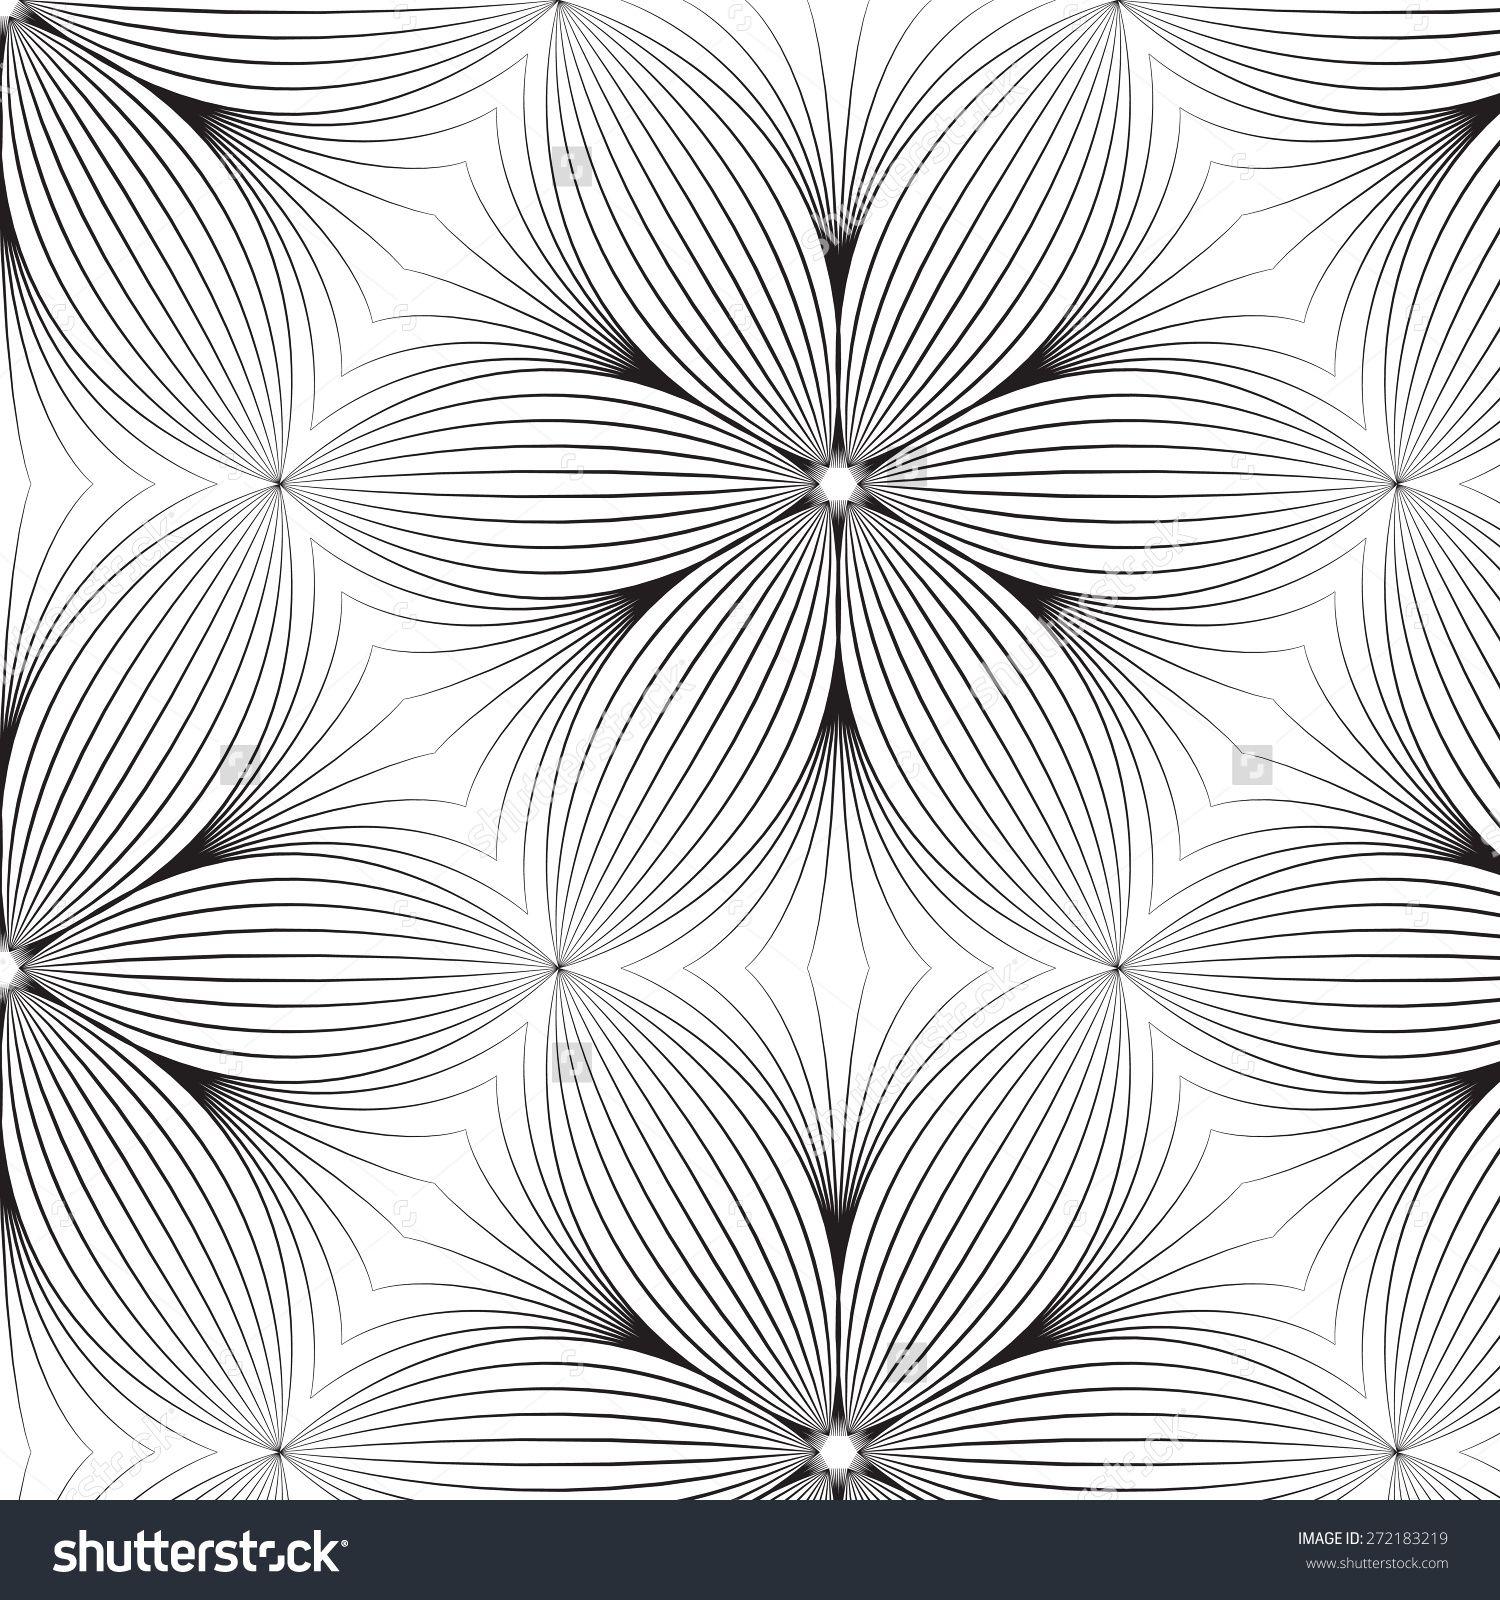 Vector Seamless Pattern Background Line Geometricmodern Stylish Texture,Wallpaper ,Vintage,